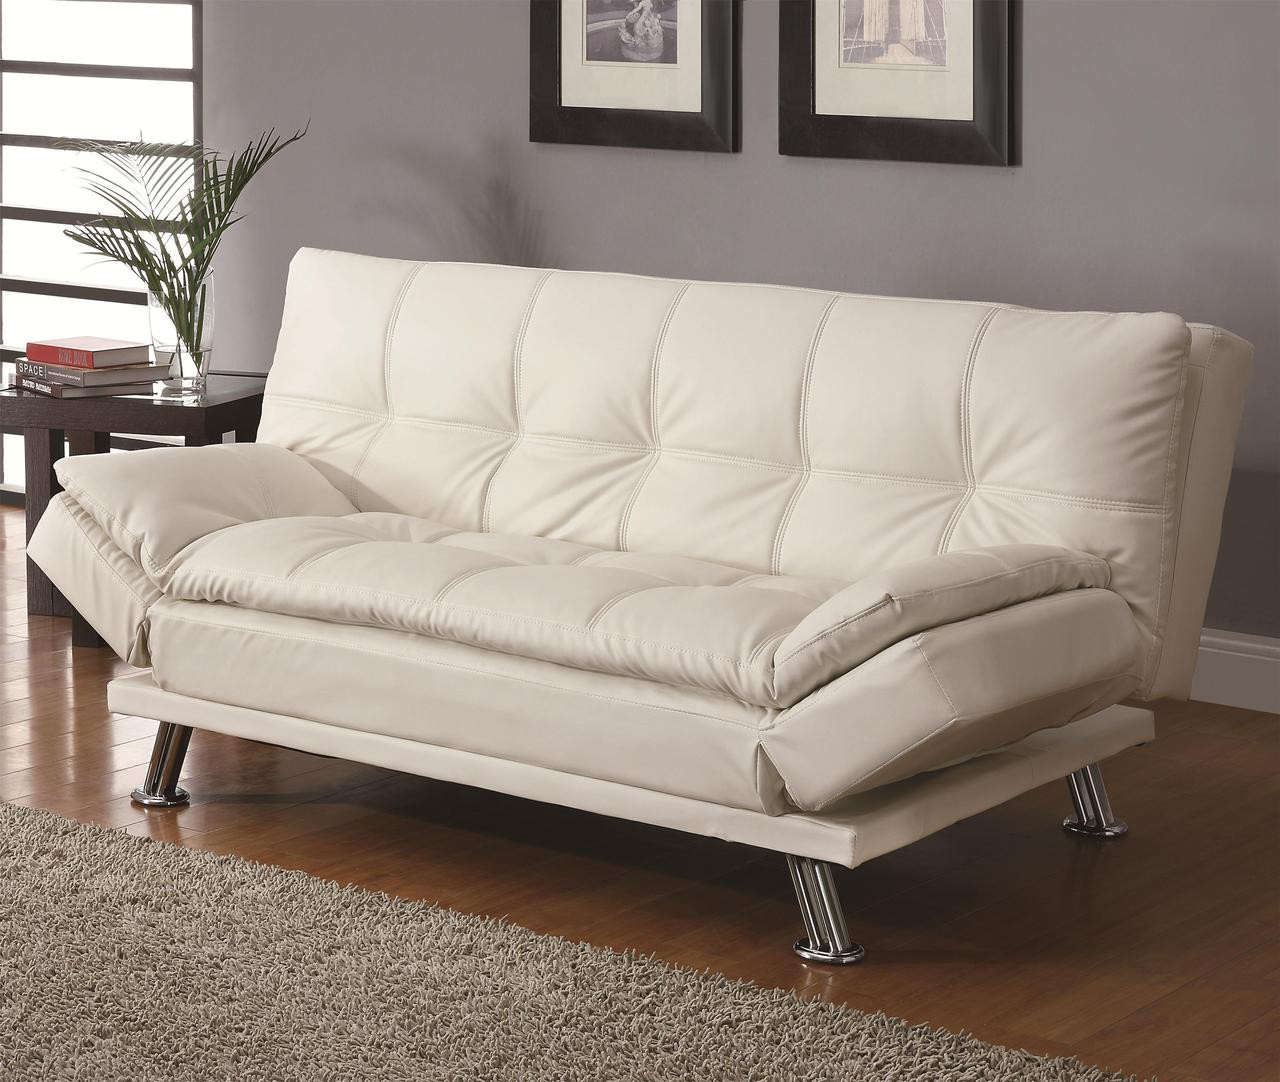 Coaster Dilleston Contemporary Sleeper Sofa Bed In White